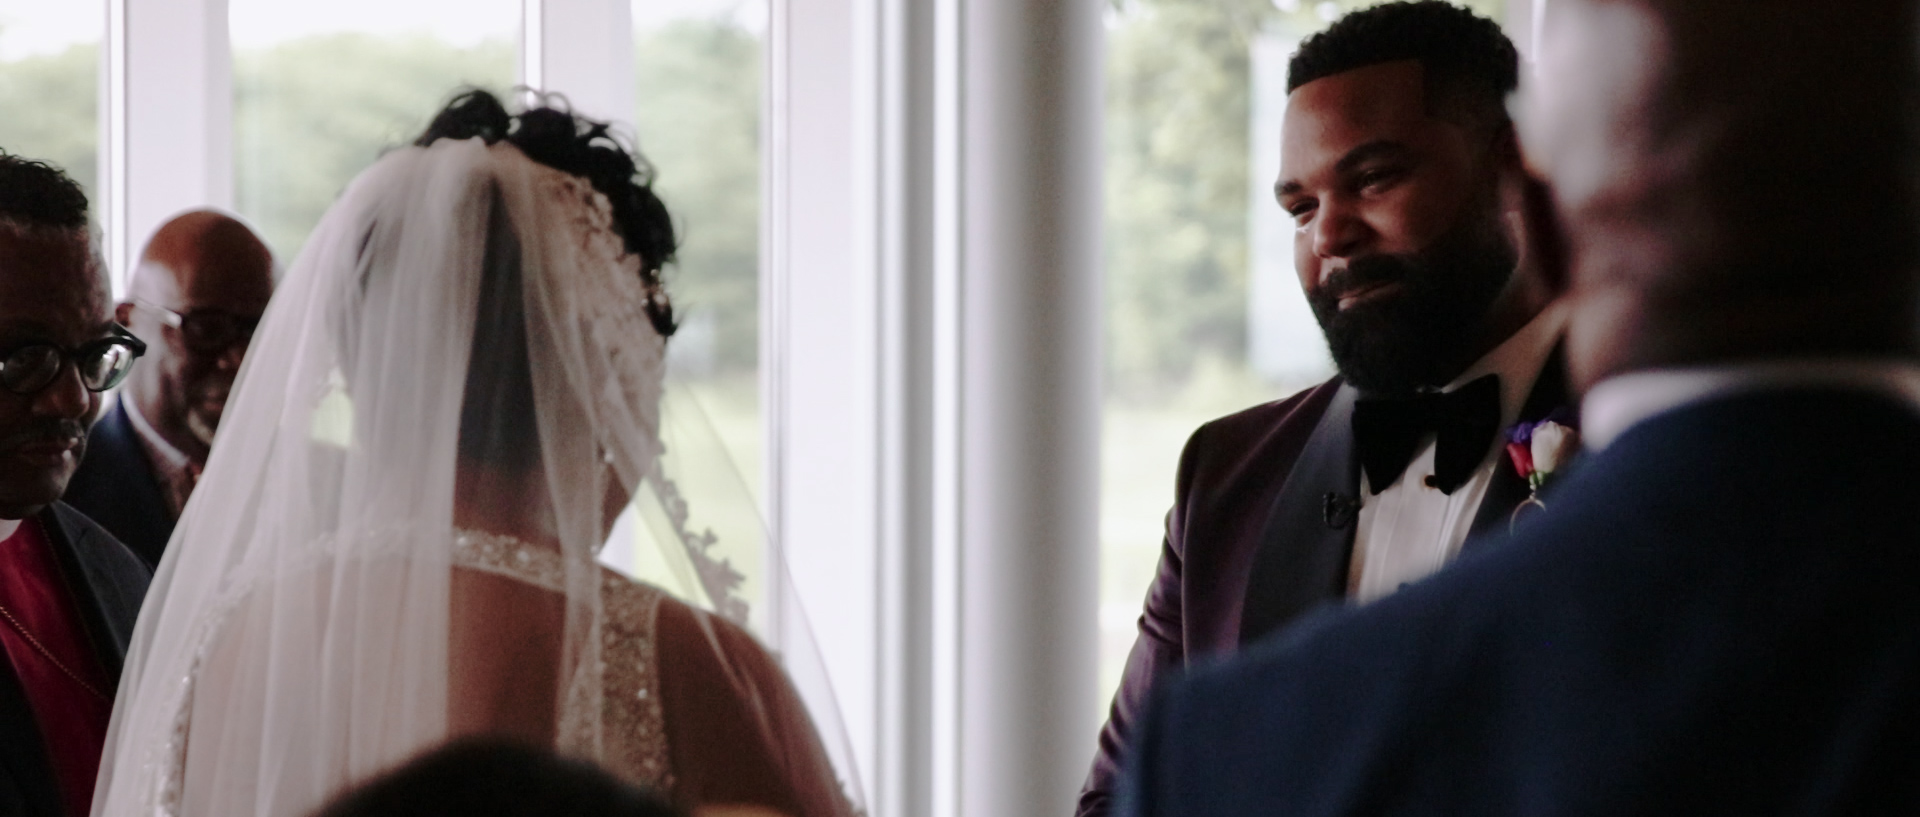 Sabrina-Wallace-groom-wedding-vows-shelby-farms-memphis-wedding-videographer.jpg